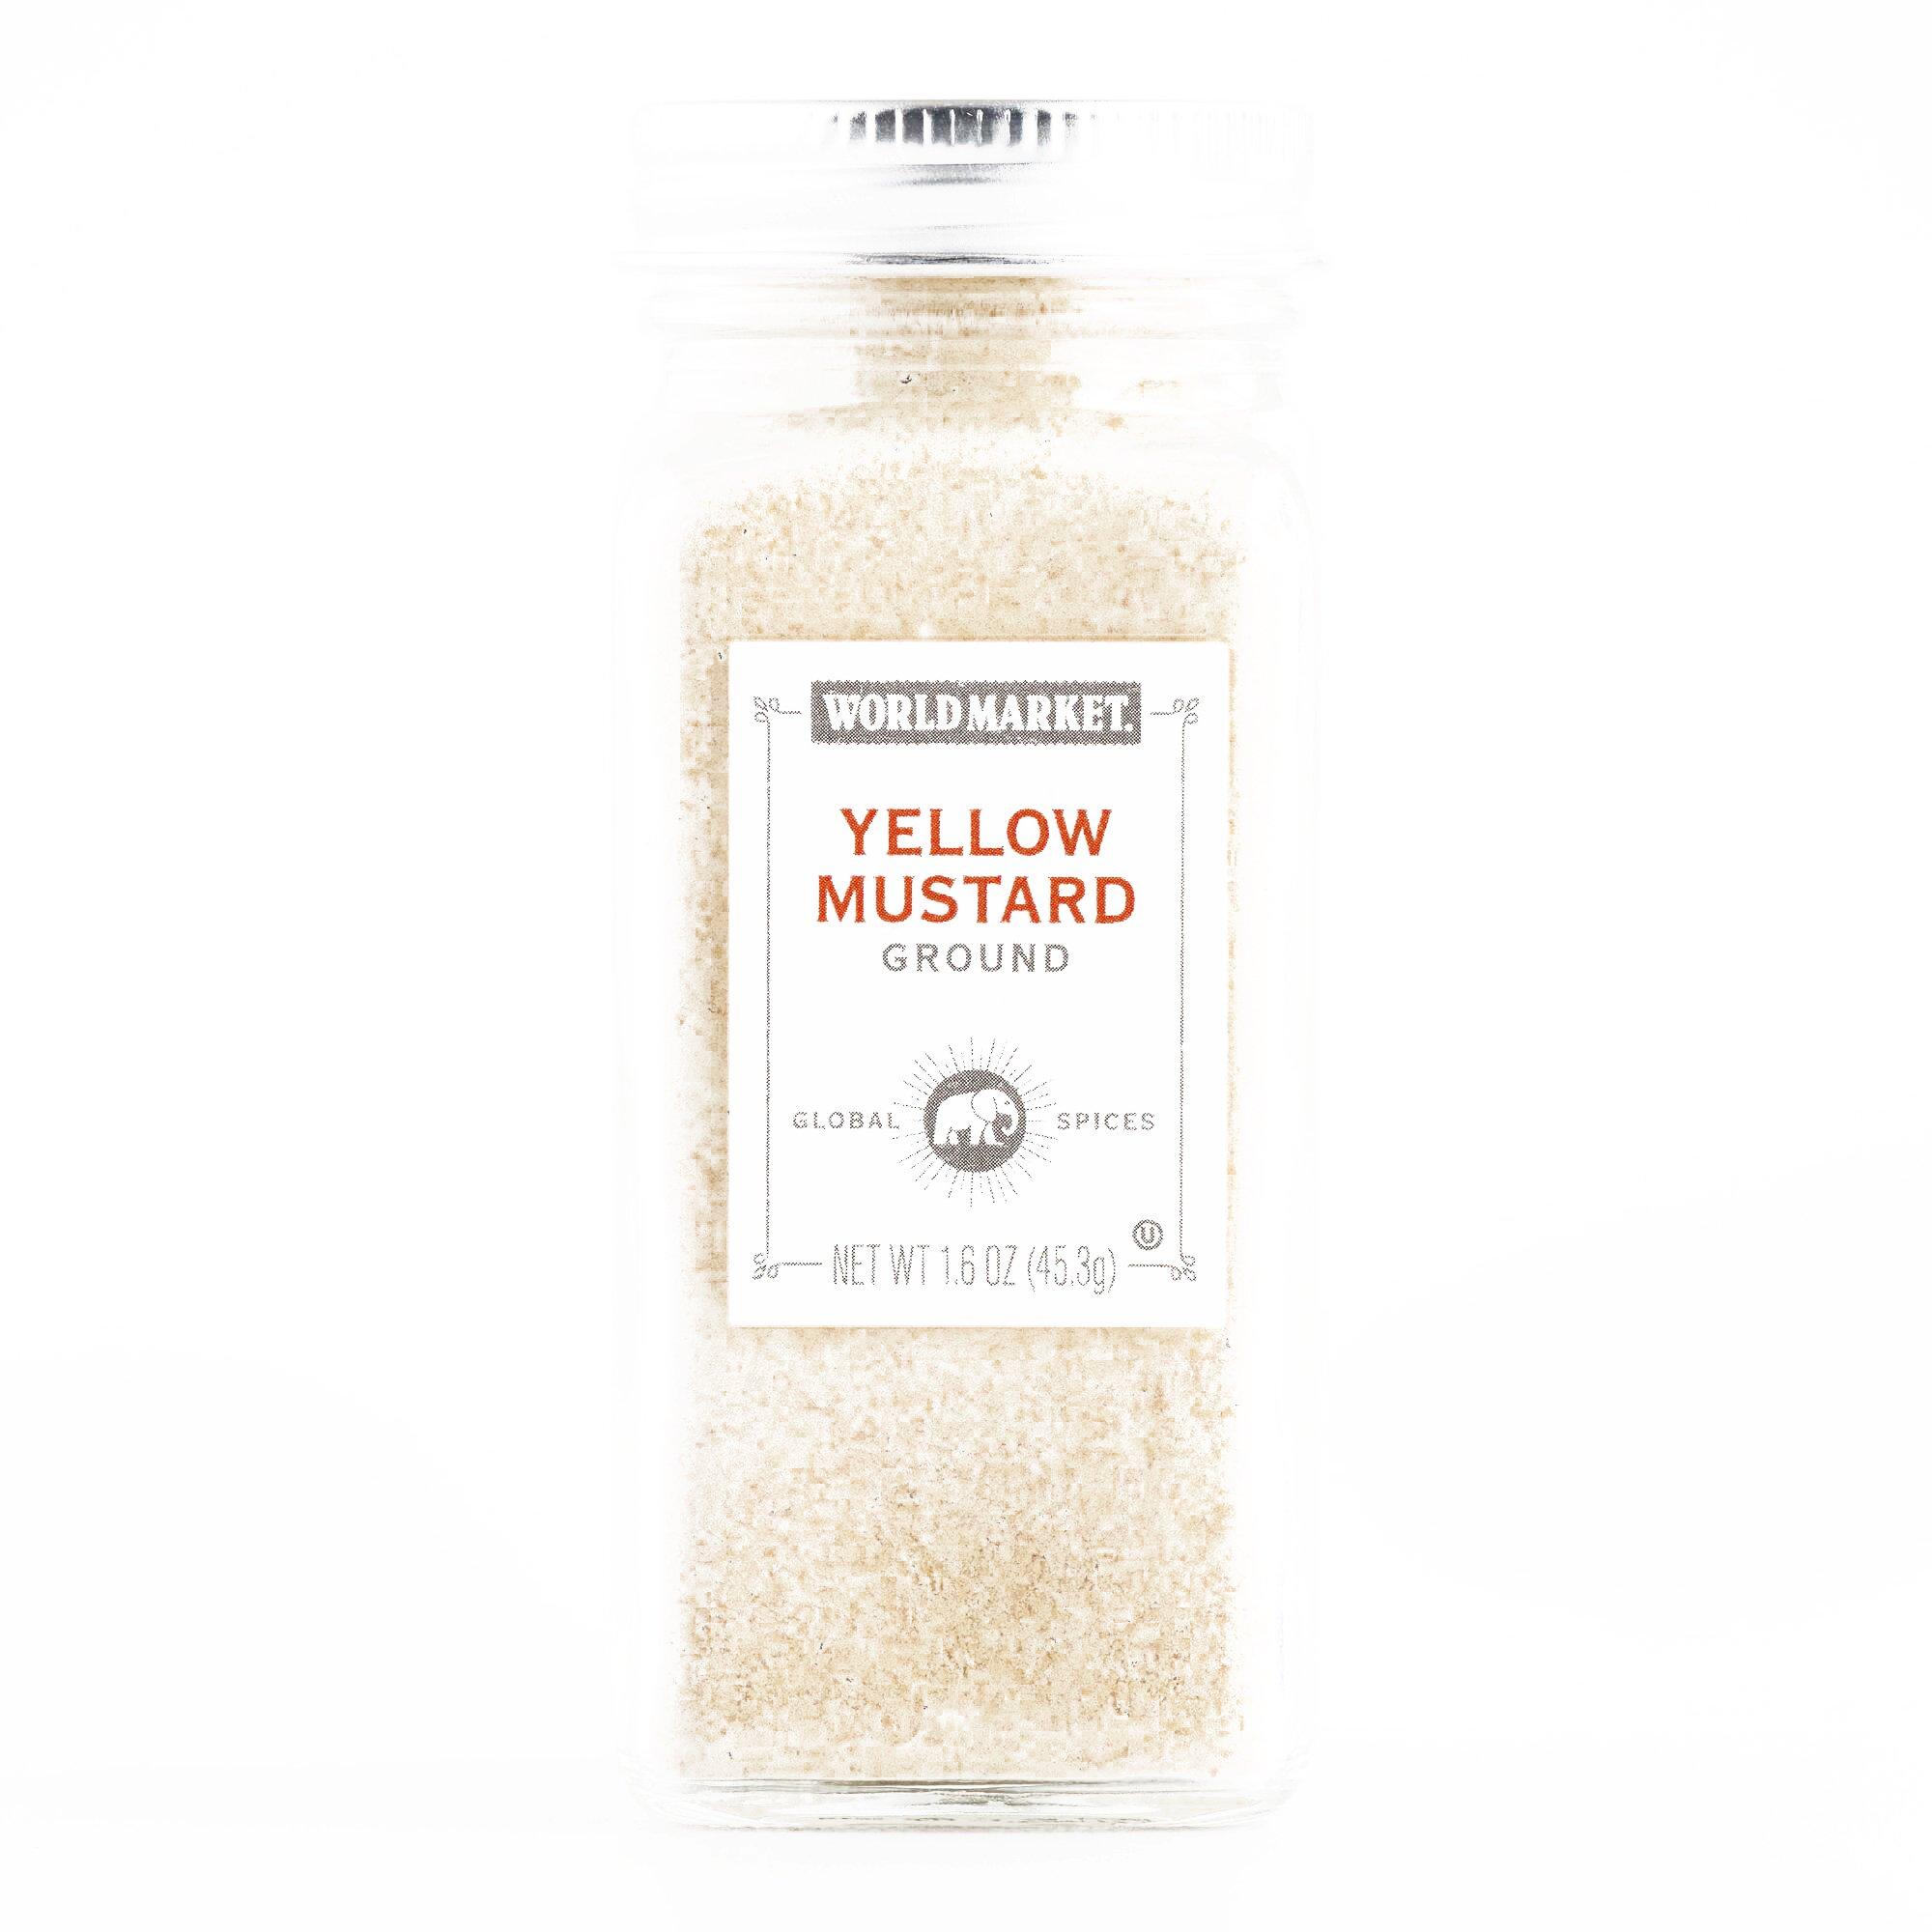 Ground Mustard 1.6 oz each (5 Items Per Order, not per case)